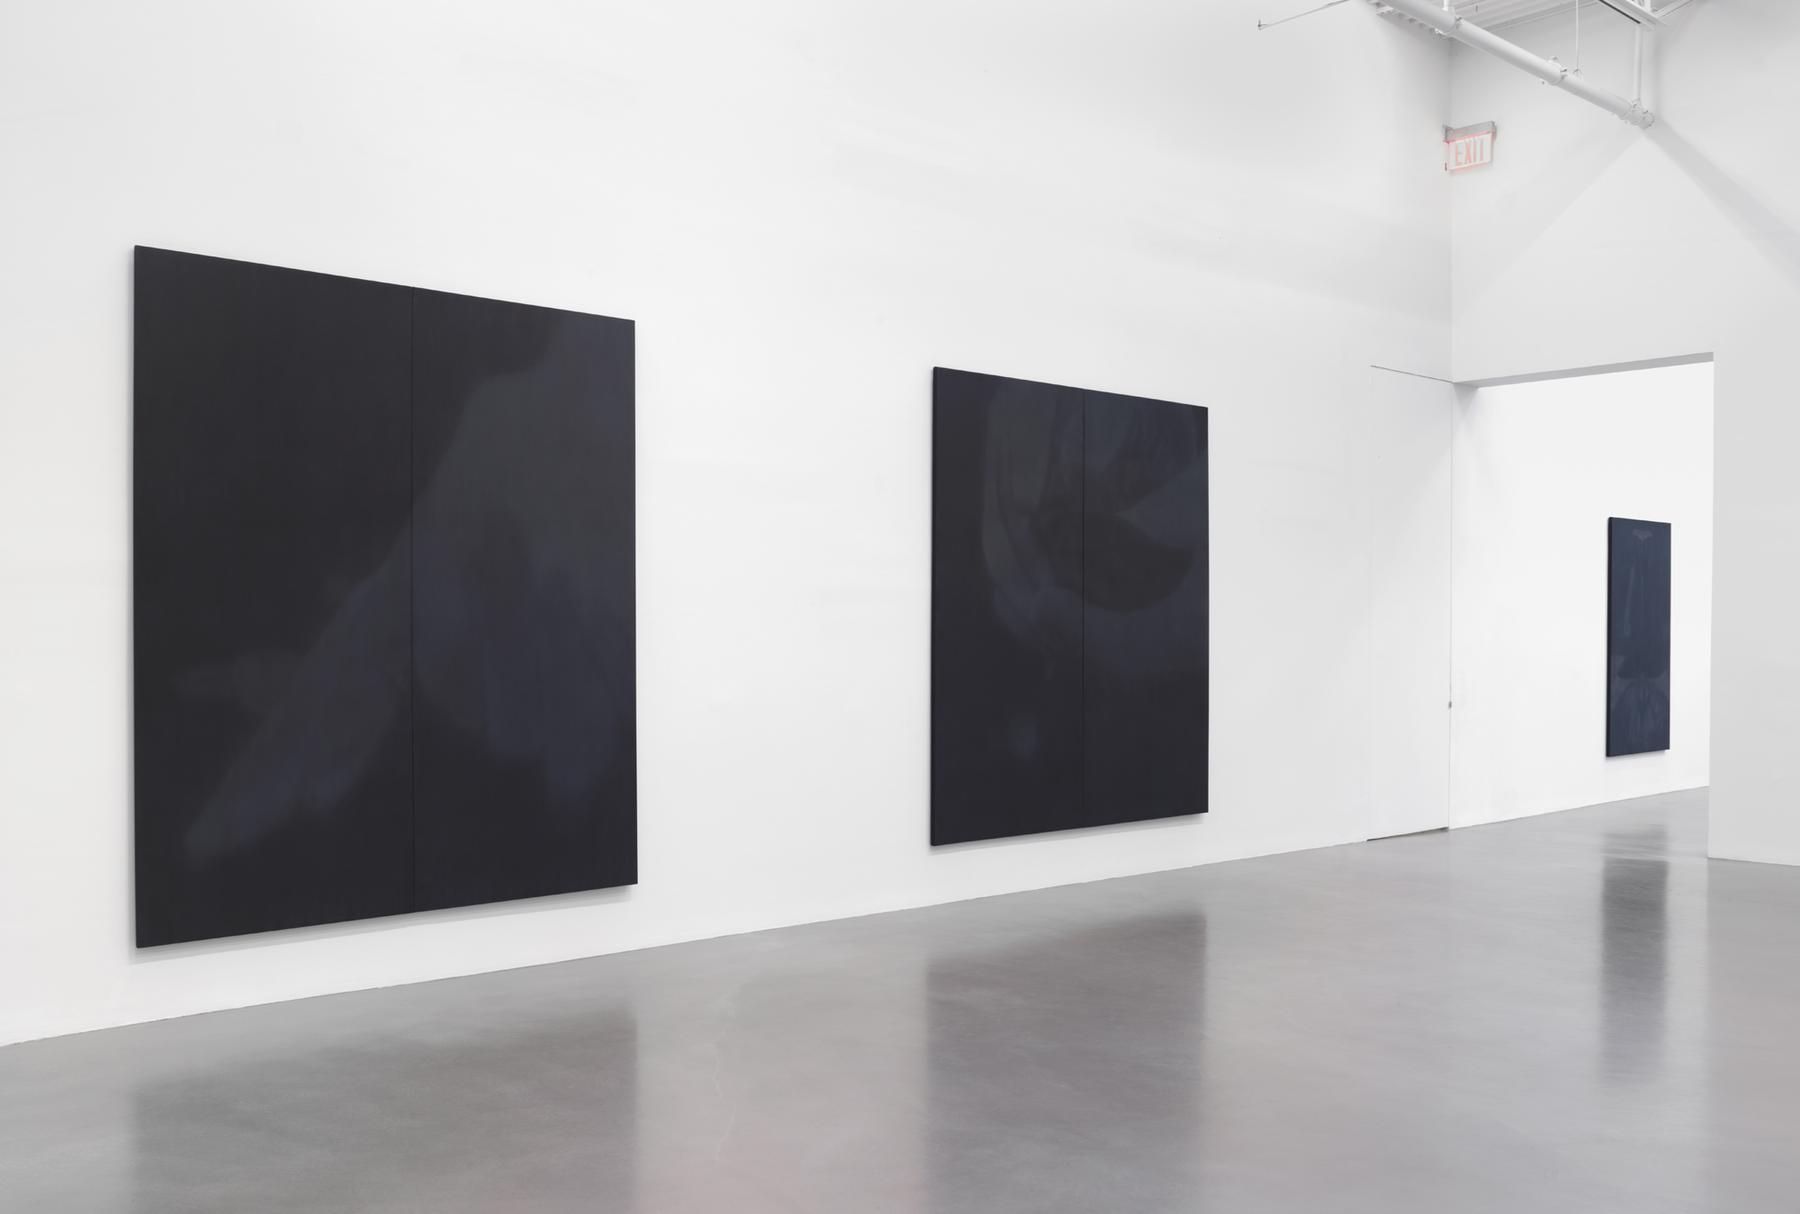 Troy Brauntuch Installation view 15